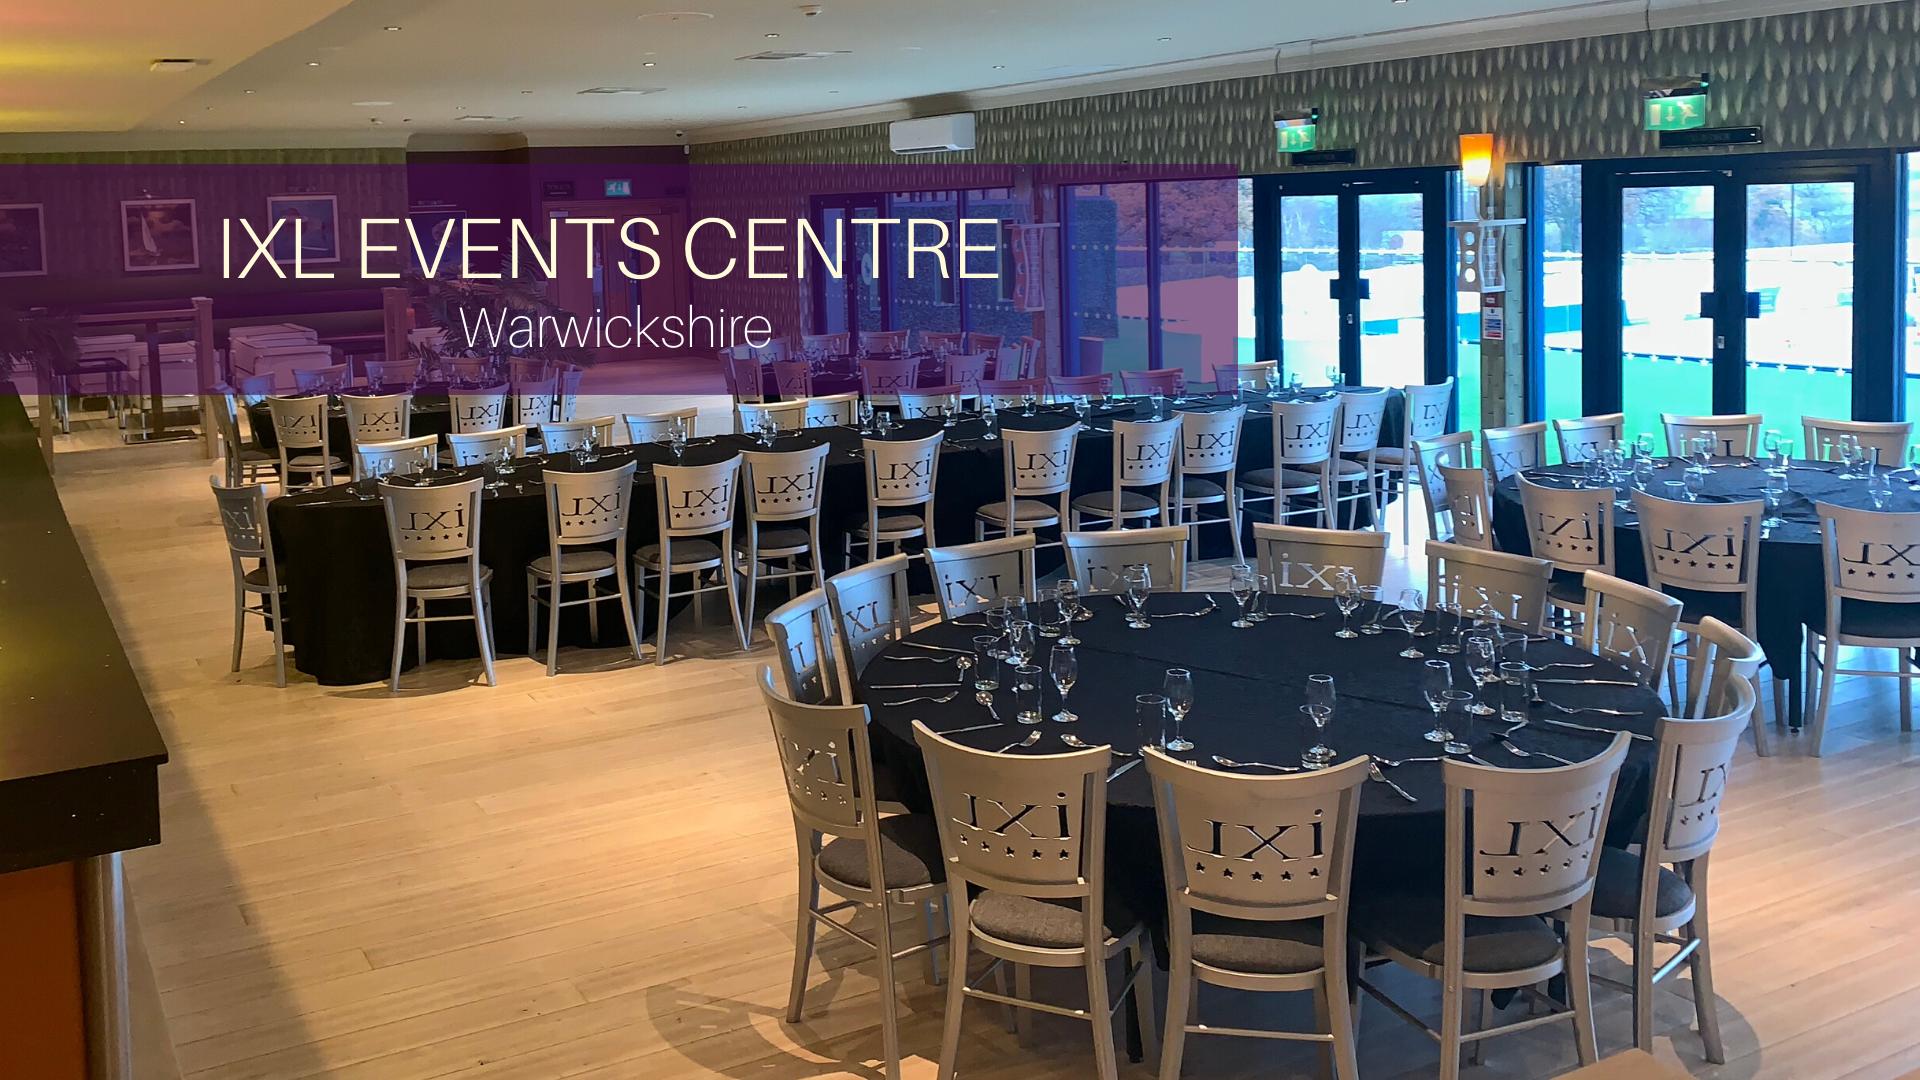 IXL Events Centre, Warwickshire